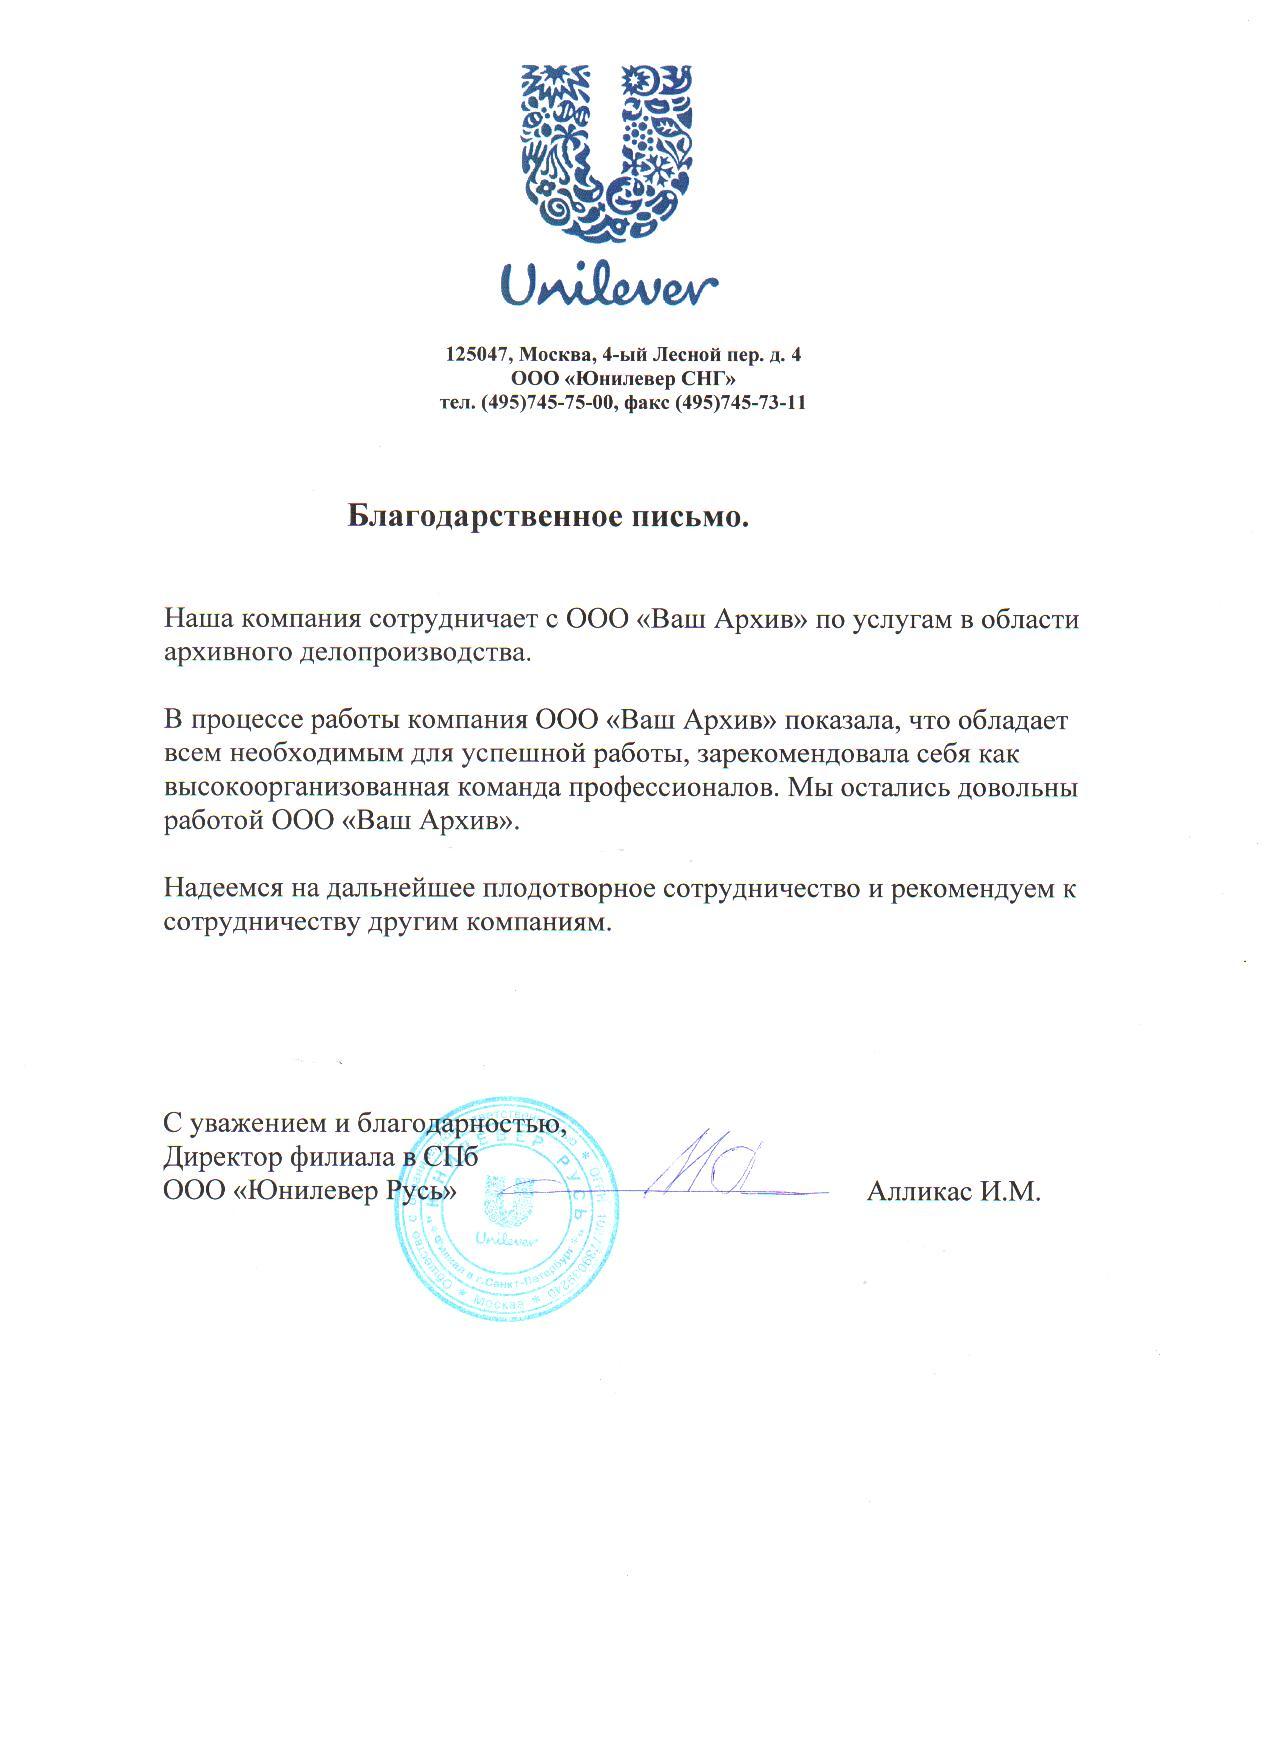 Юнилевер СНГ